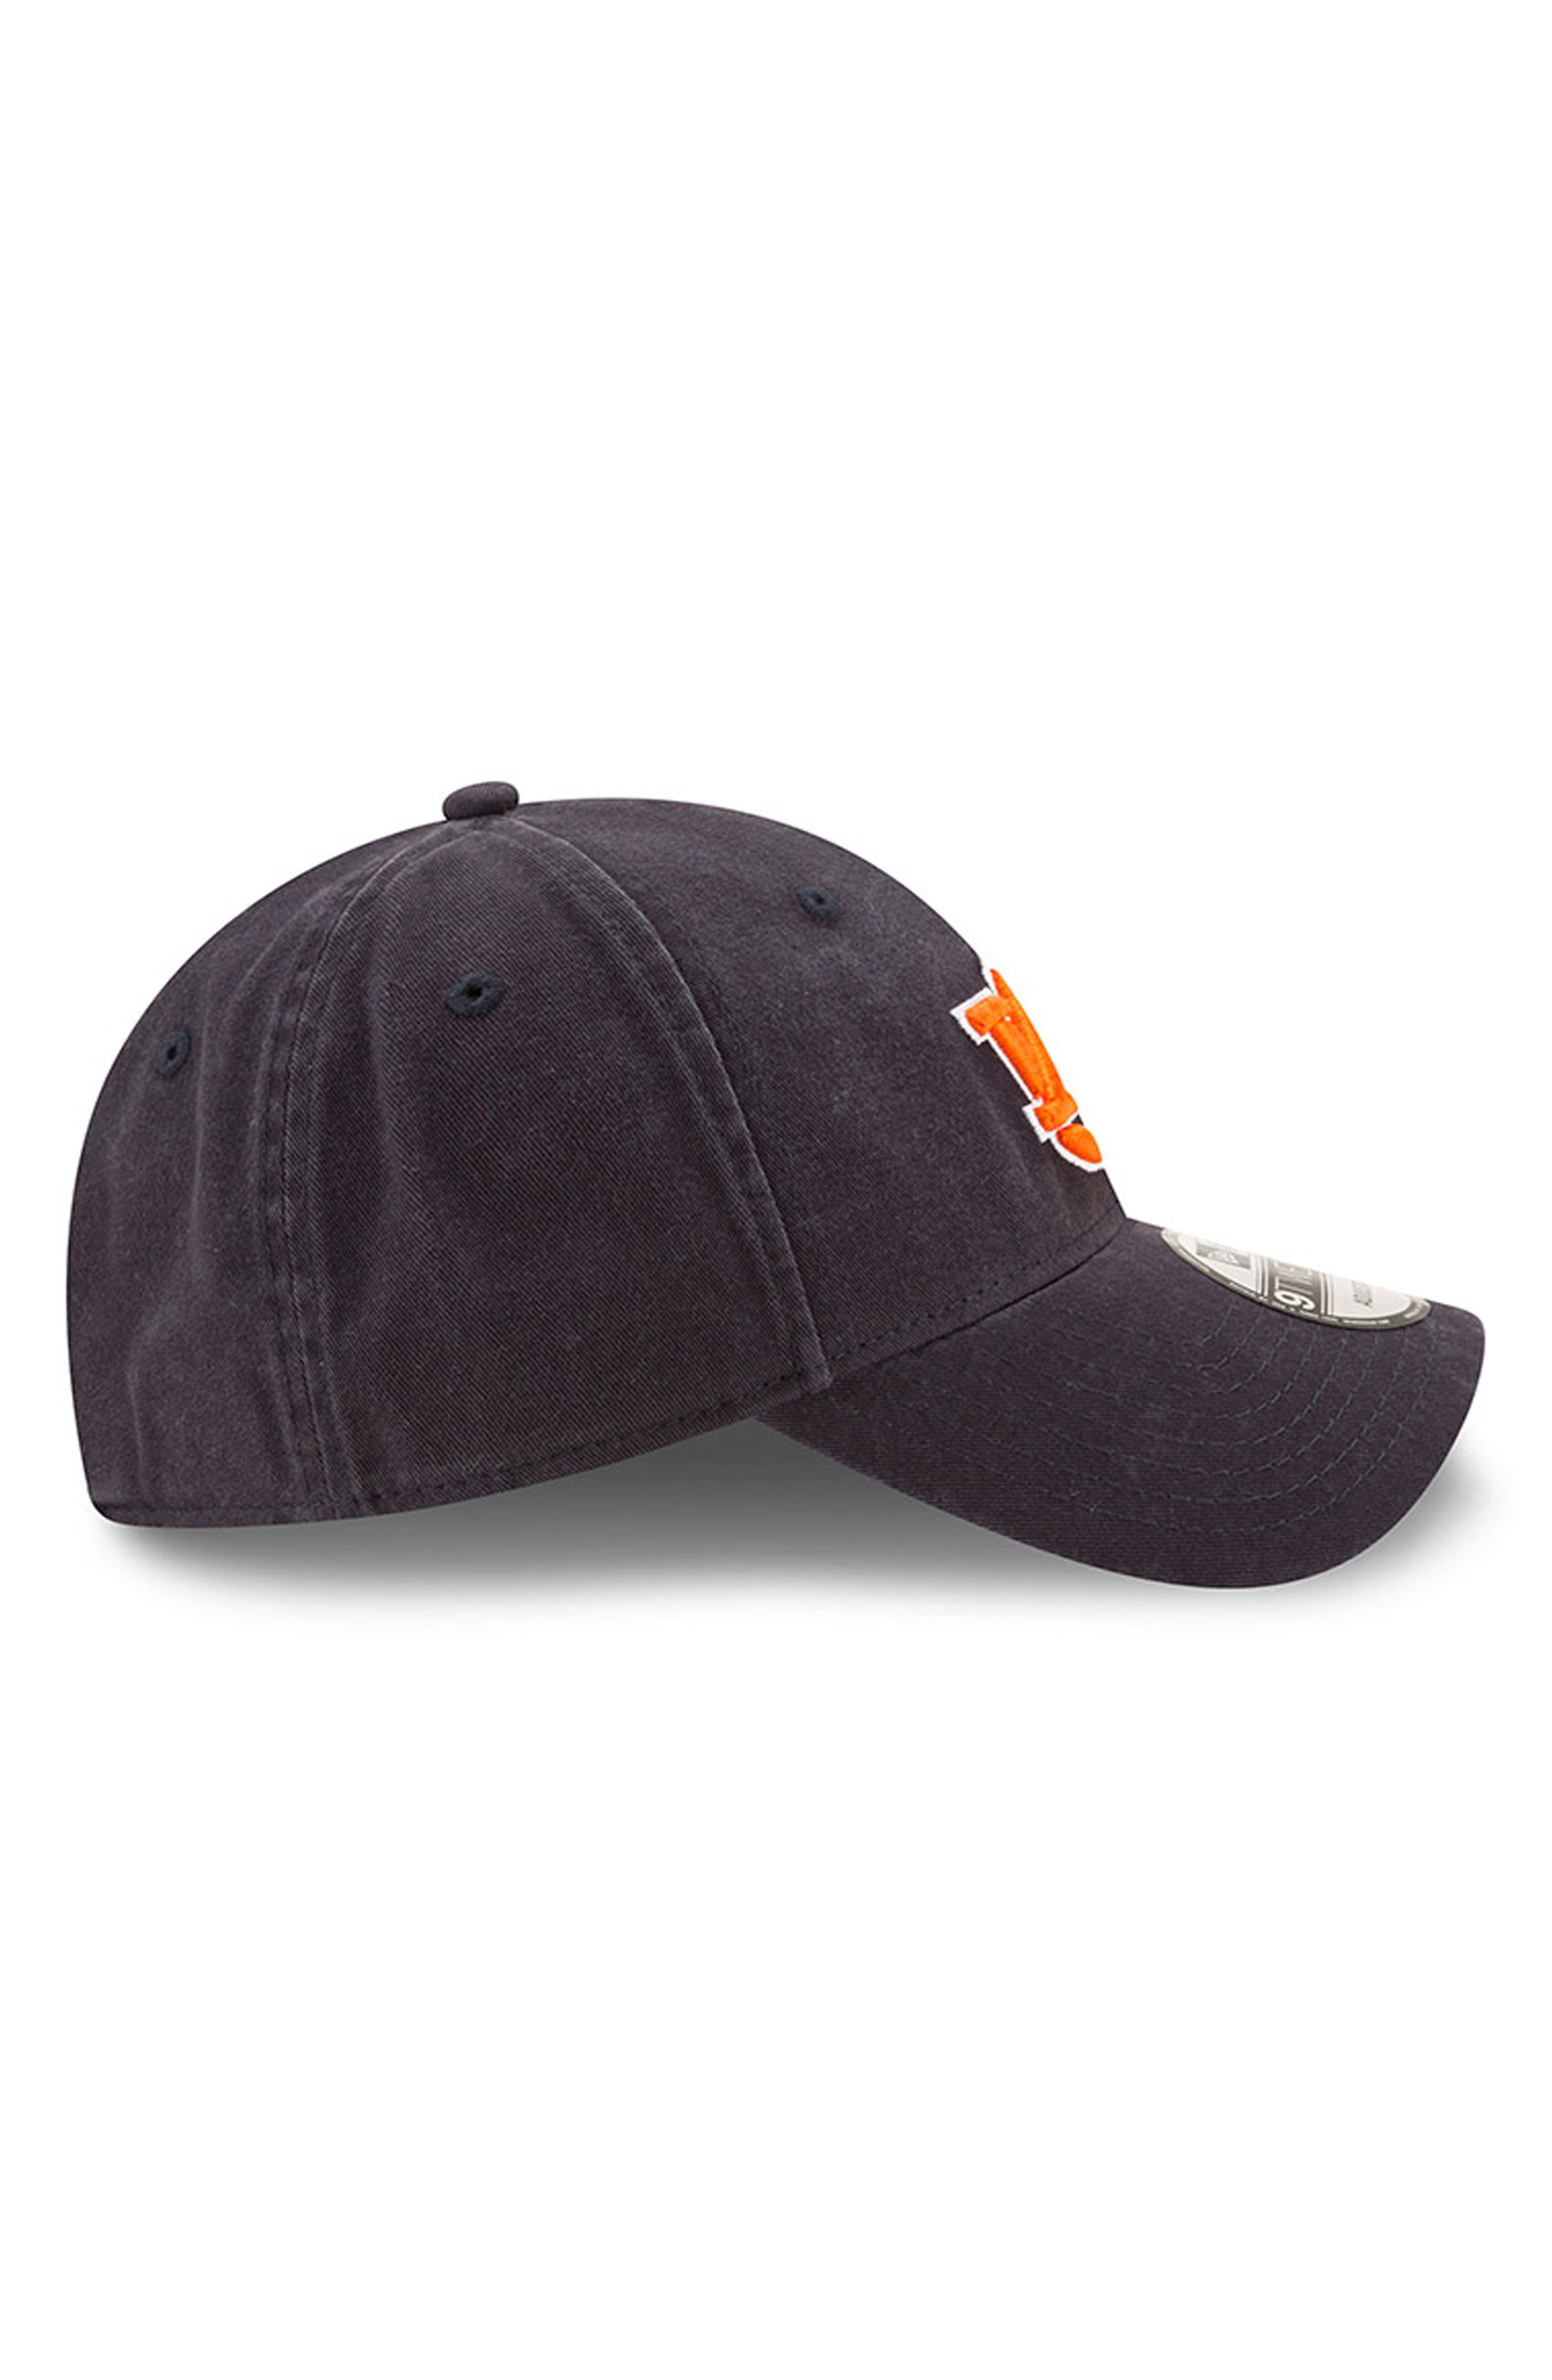 New Era Collegiate Core Classic - Auburn Tigers Baseball Cap,                             Alternate thumbnail 3, color,                             Auburn Tigers